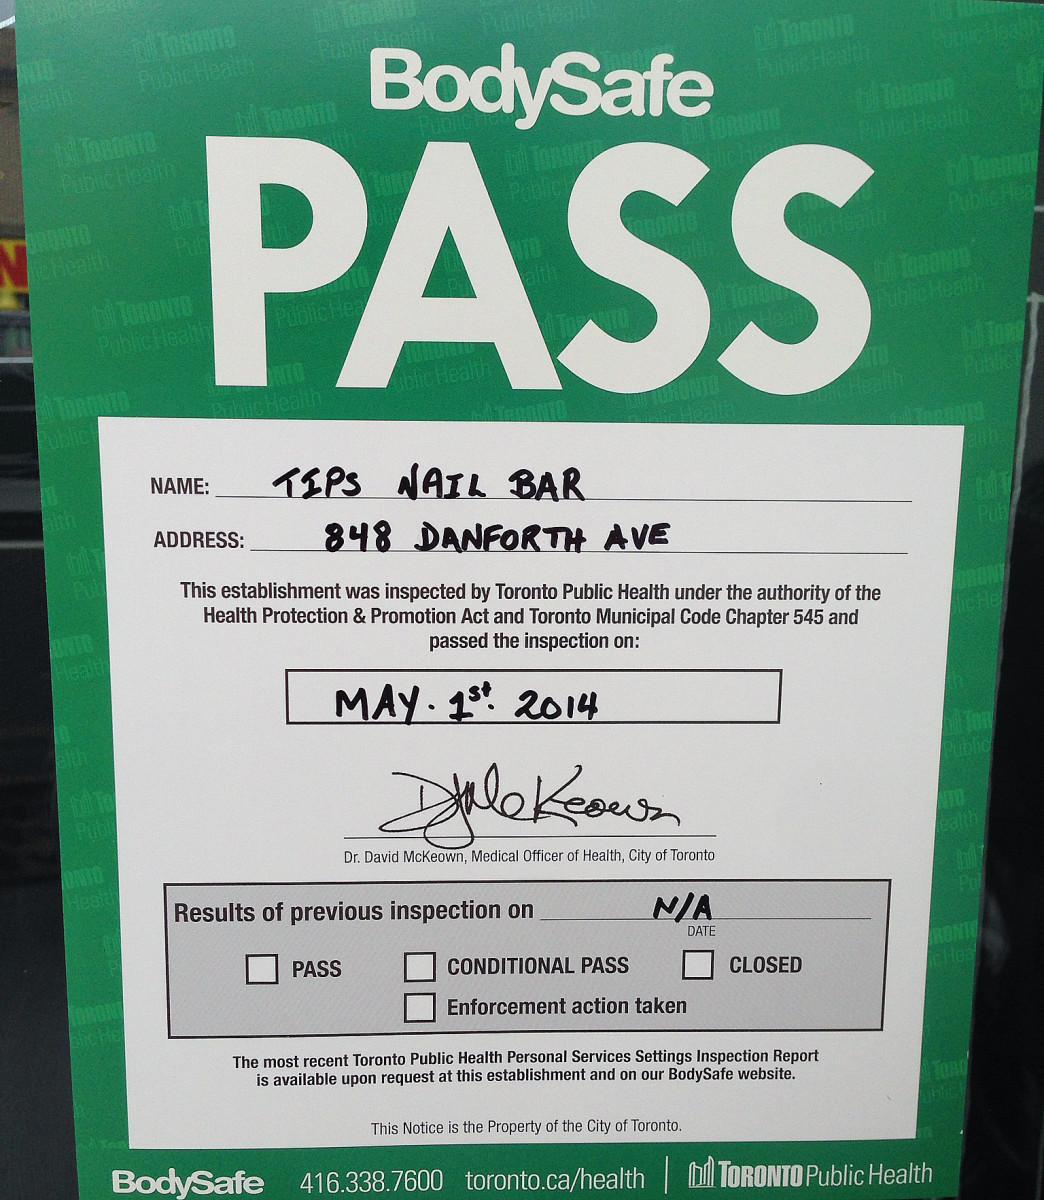 Toronto Public Health BodySafe Pass_Tips Nail Bar 2014